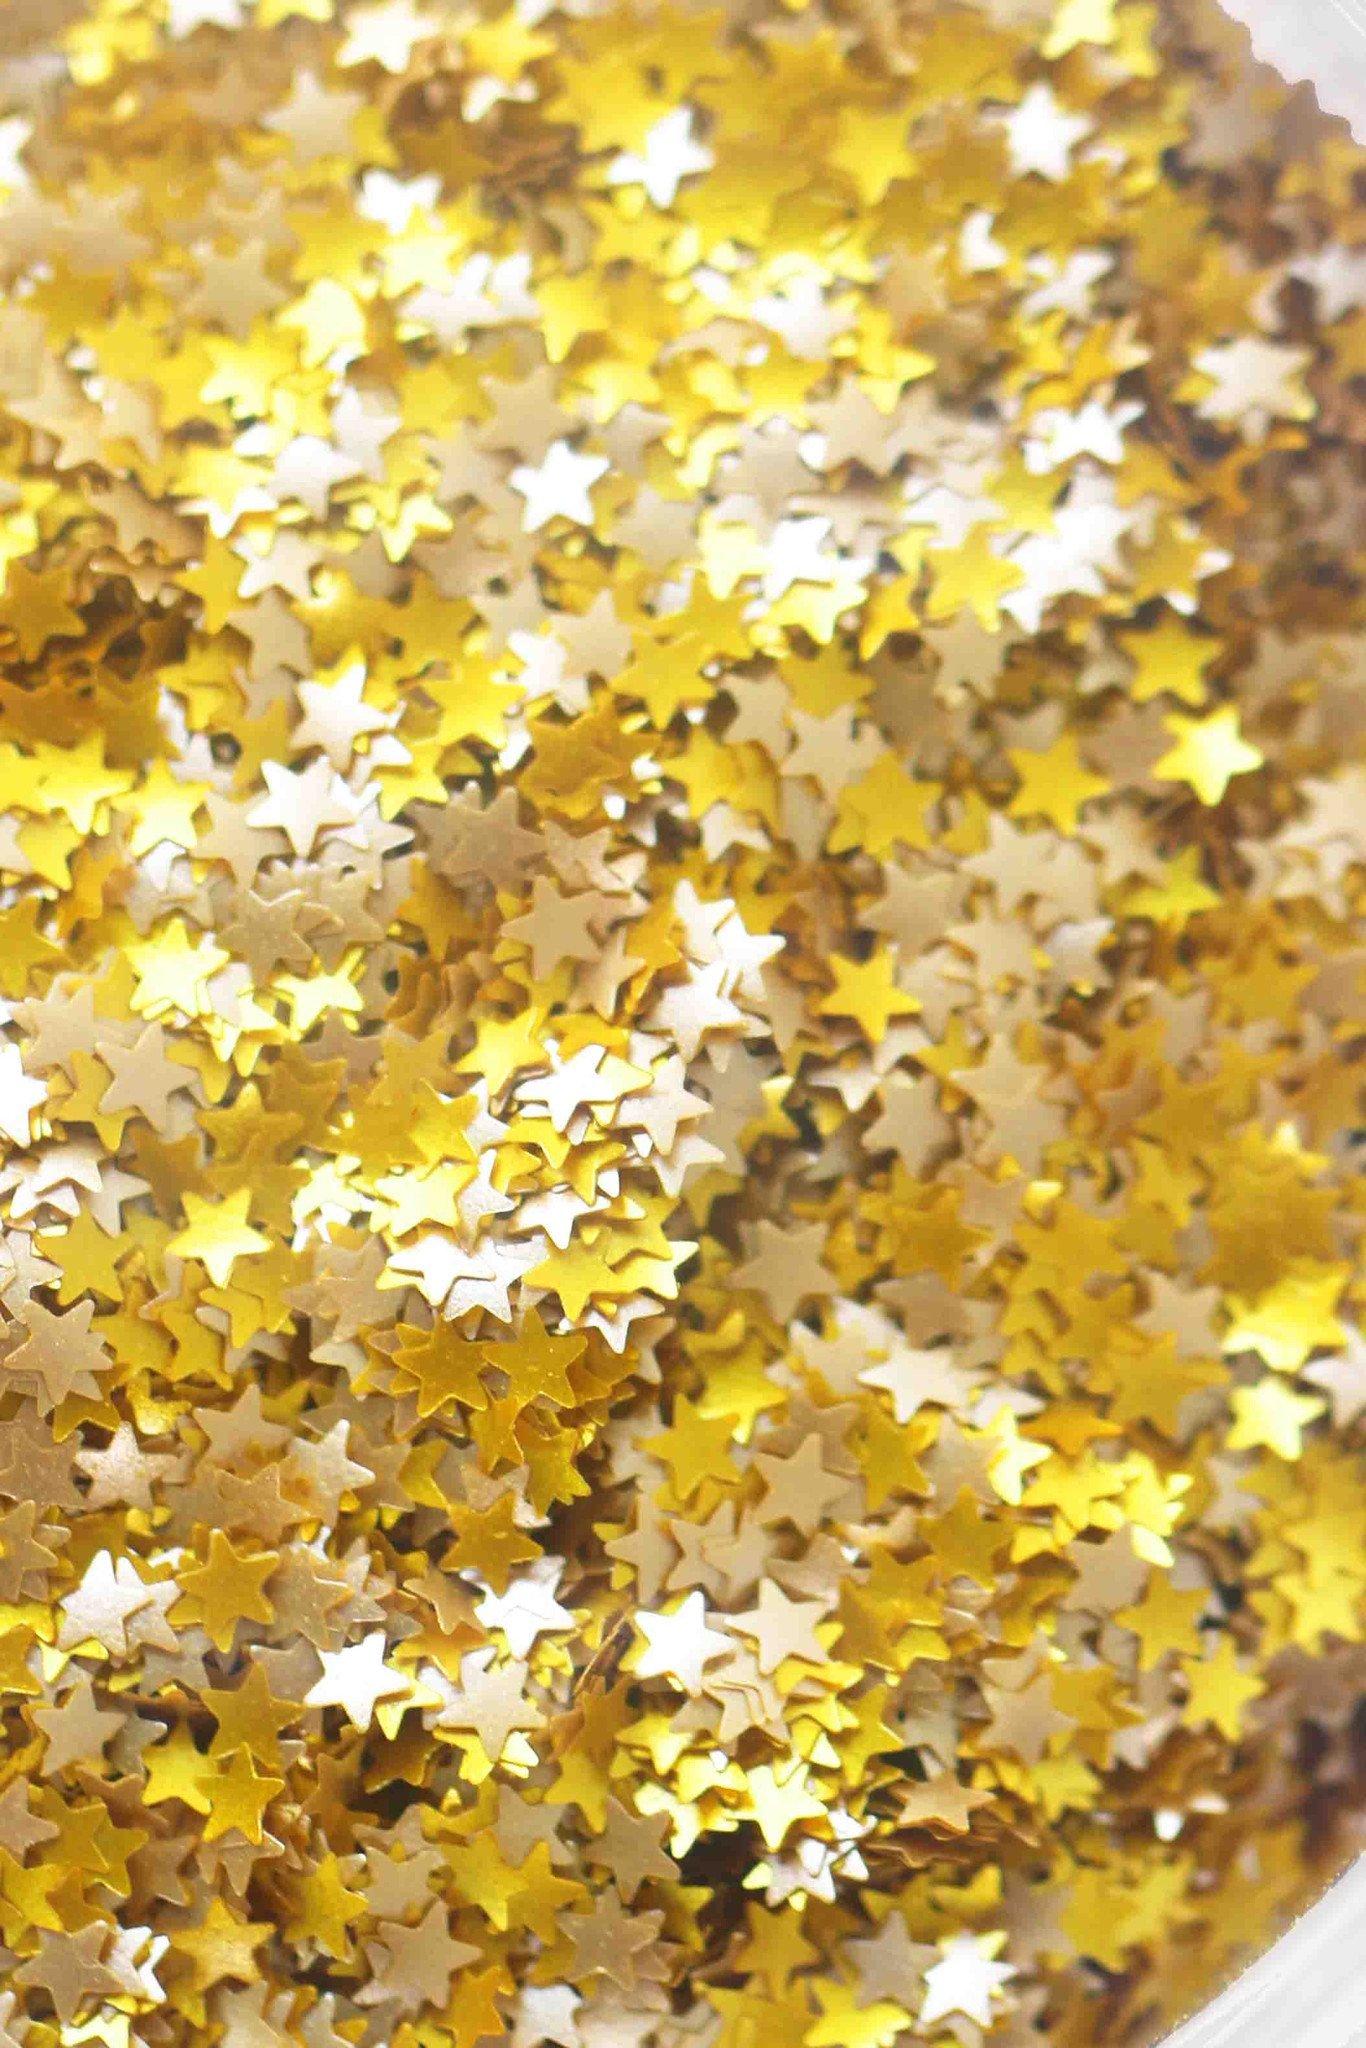 GOLD METALLIC GLITTER STARS (VEGAN) Metallic Gold Stars Edible Shimmer Glitter 5 grams for Cupcakes Cakes and Cookies